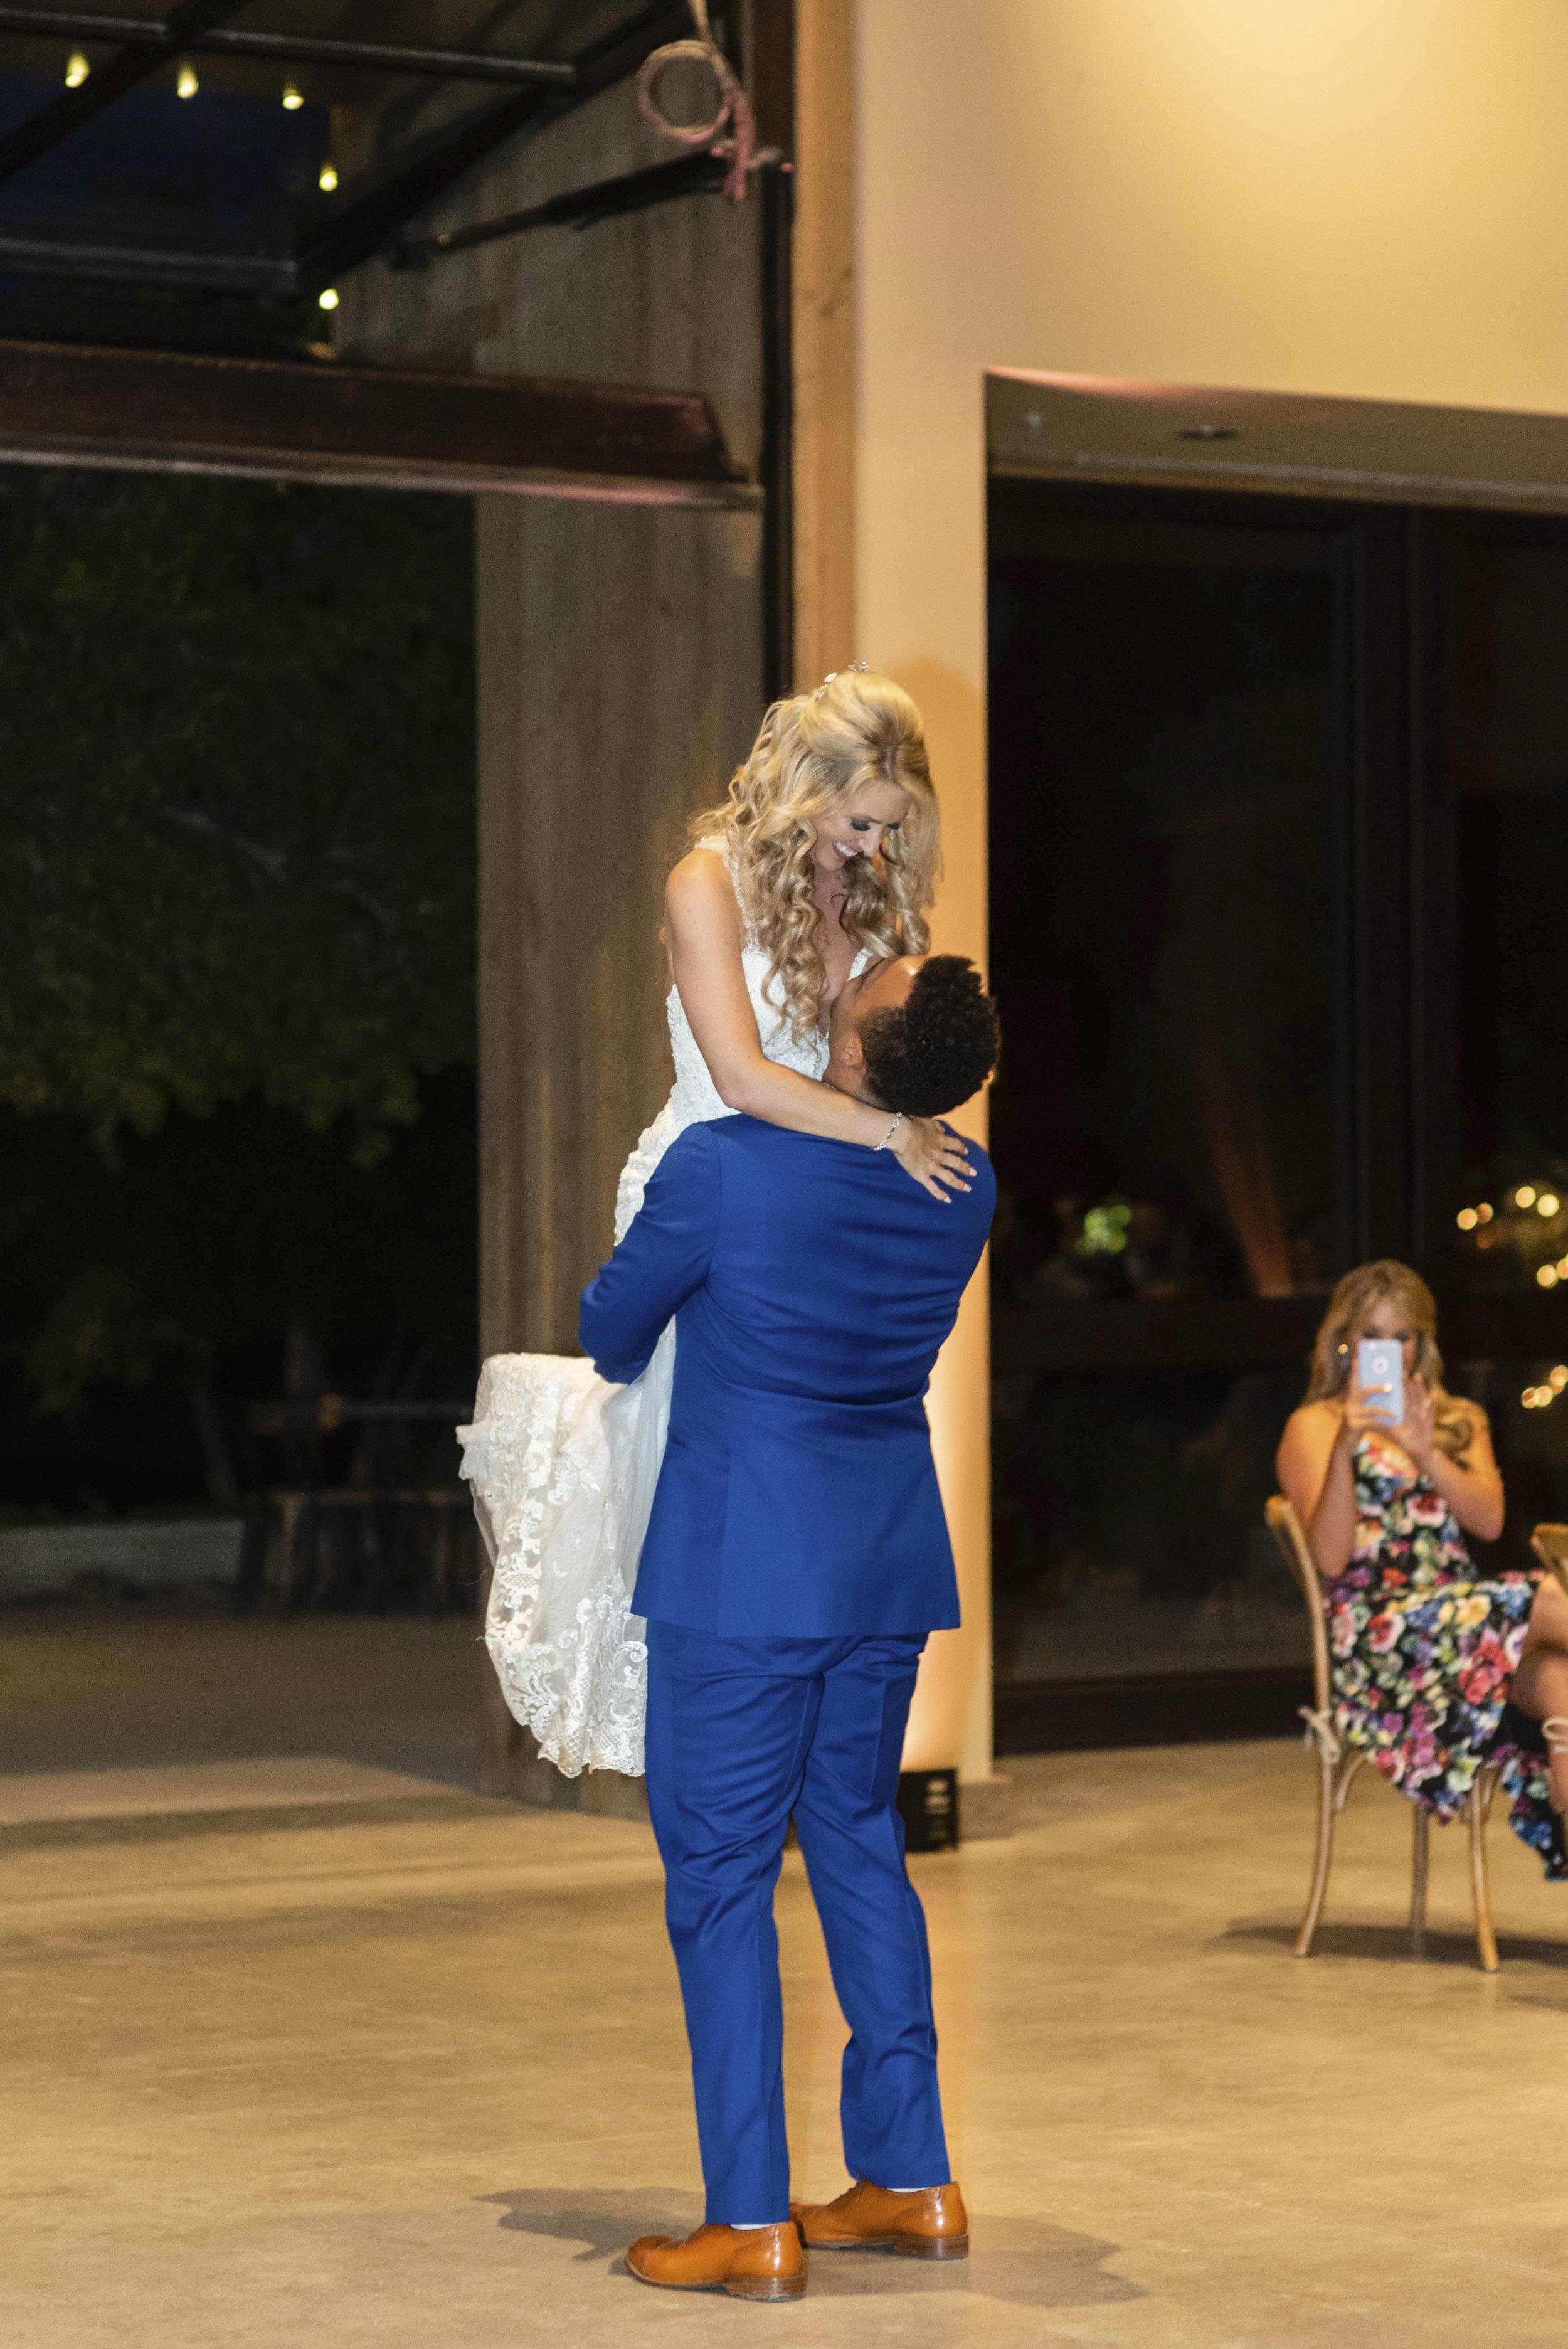 Domenica Beauty _ Hair and Makeup Artist _Wedding _ Temecula, CA Wedding _ Briana and Samuel _ 40.JPG